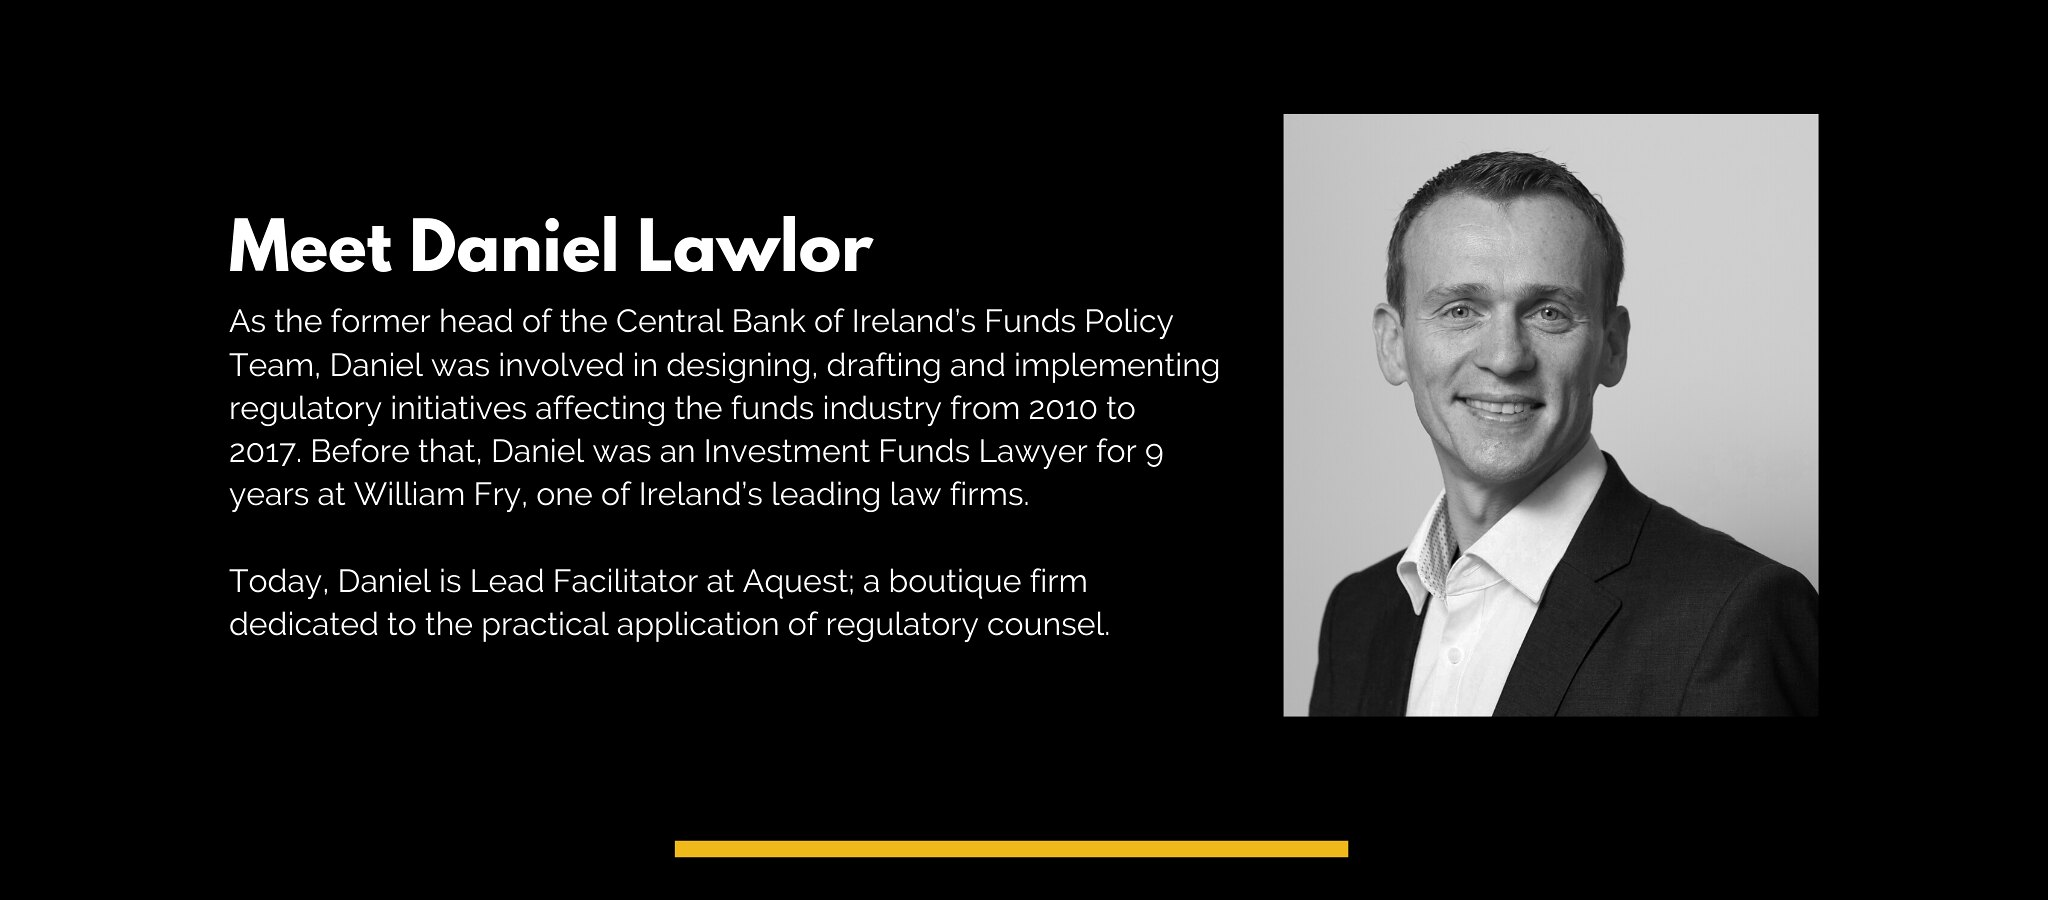 Meet Daniel Lawlor